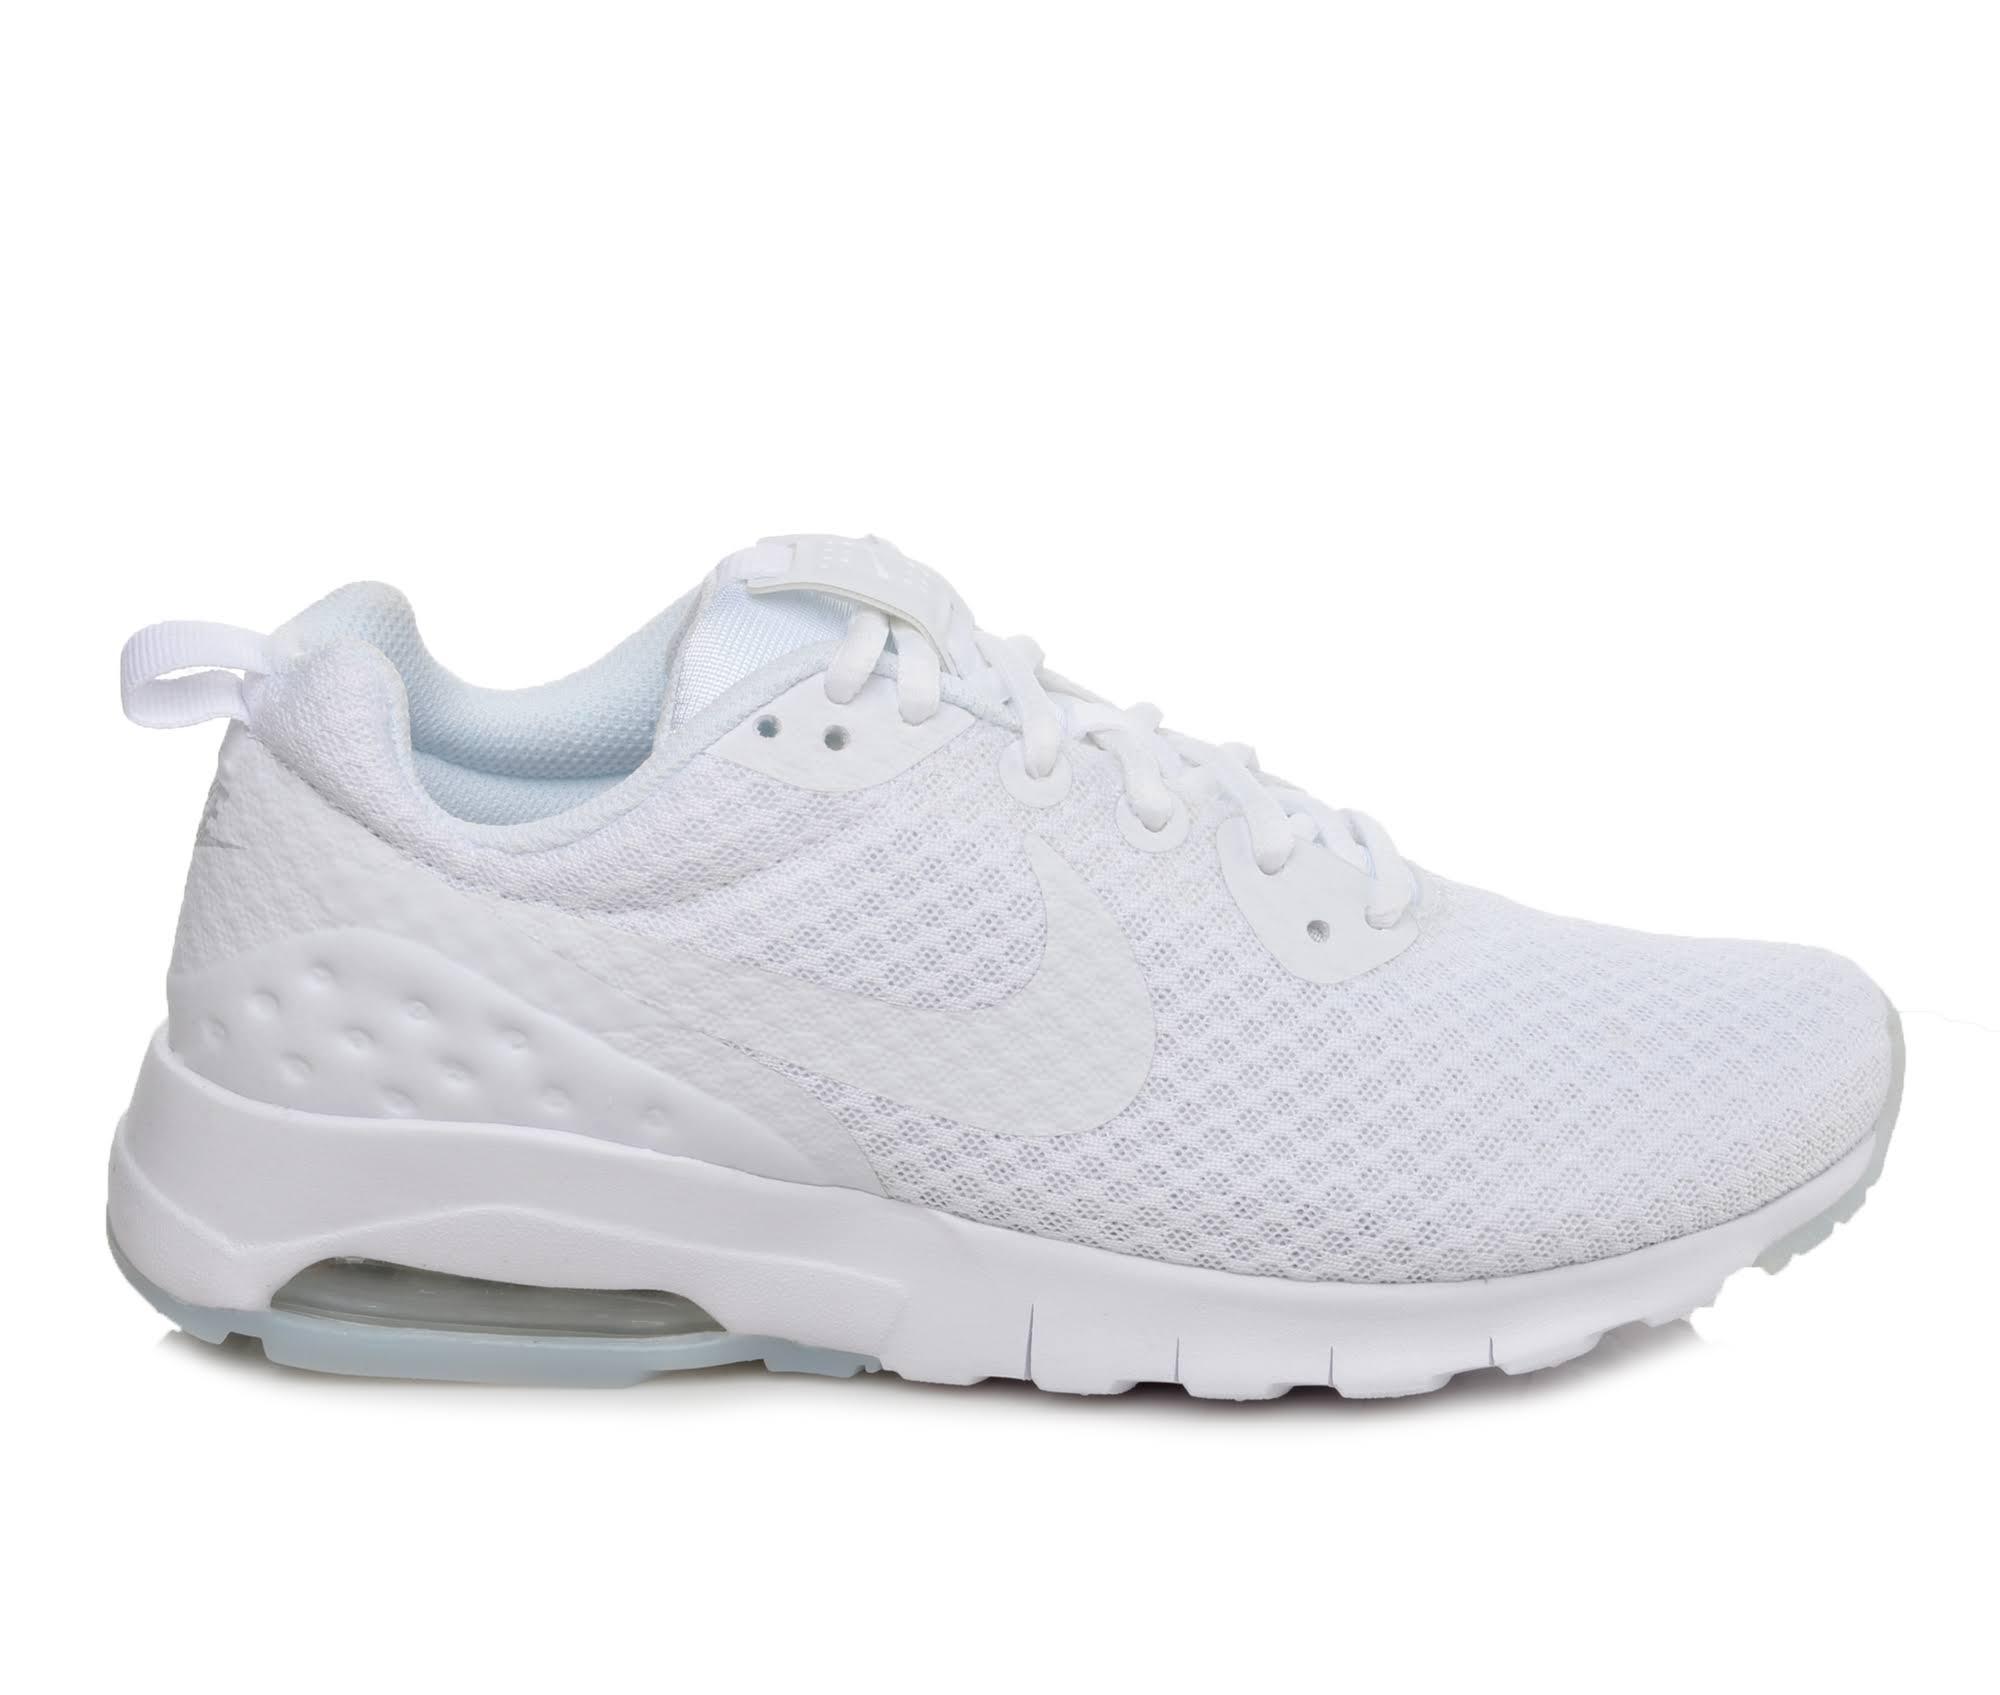 damesdamesdamesdamesdamesdameszwartwit Nike voor Nike Hardloopschoen Hardloopschoen P0wOk8n